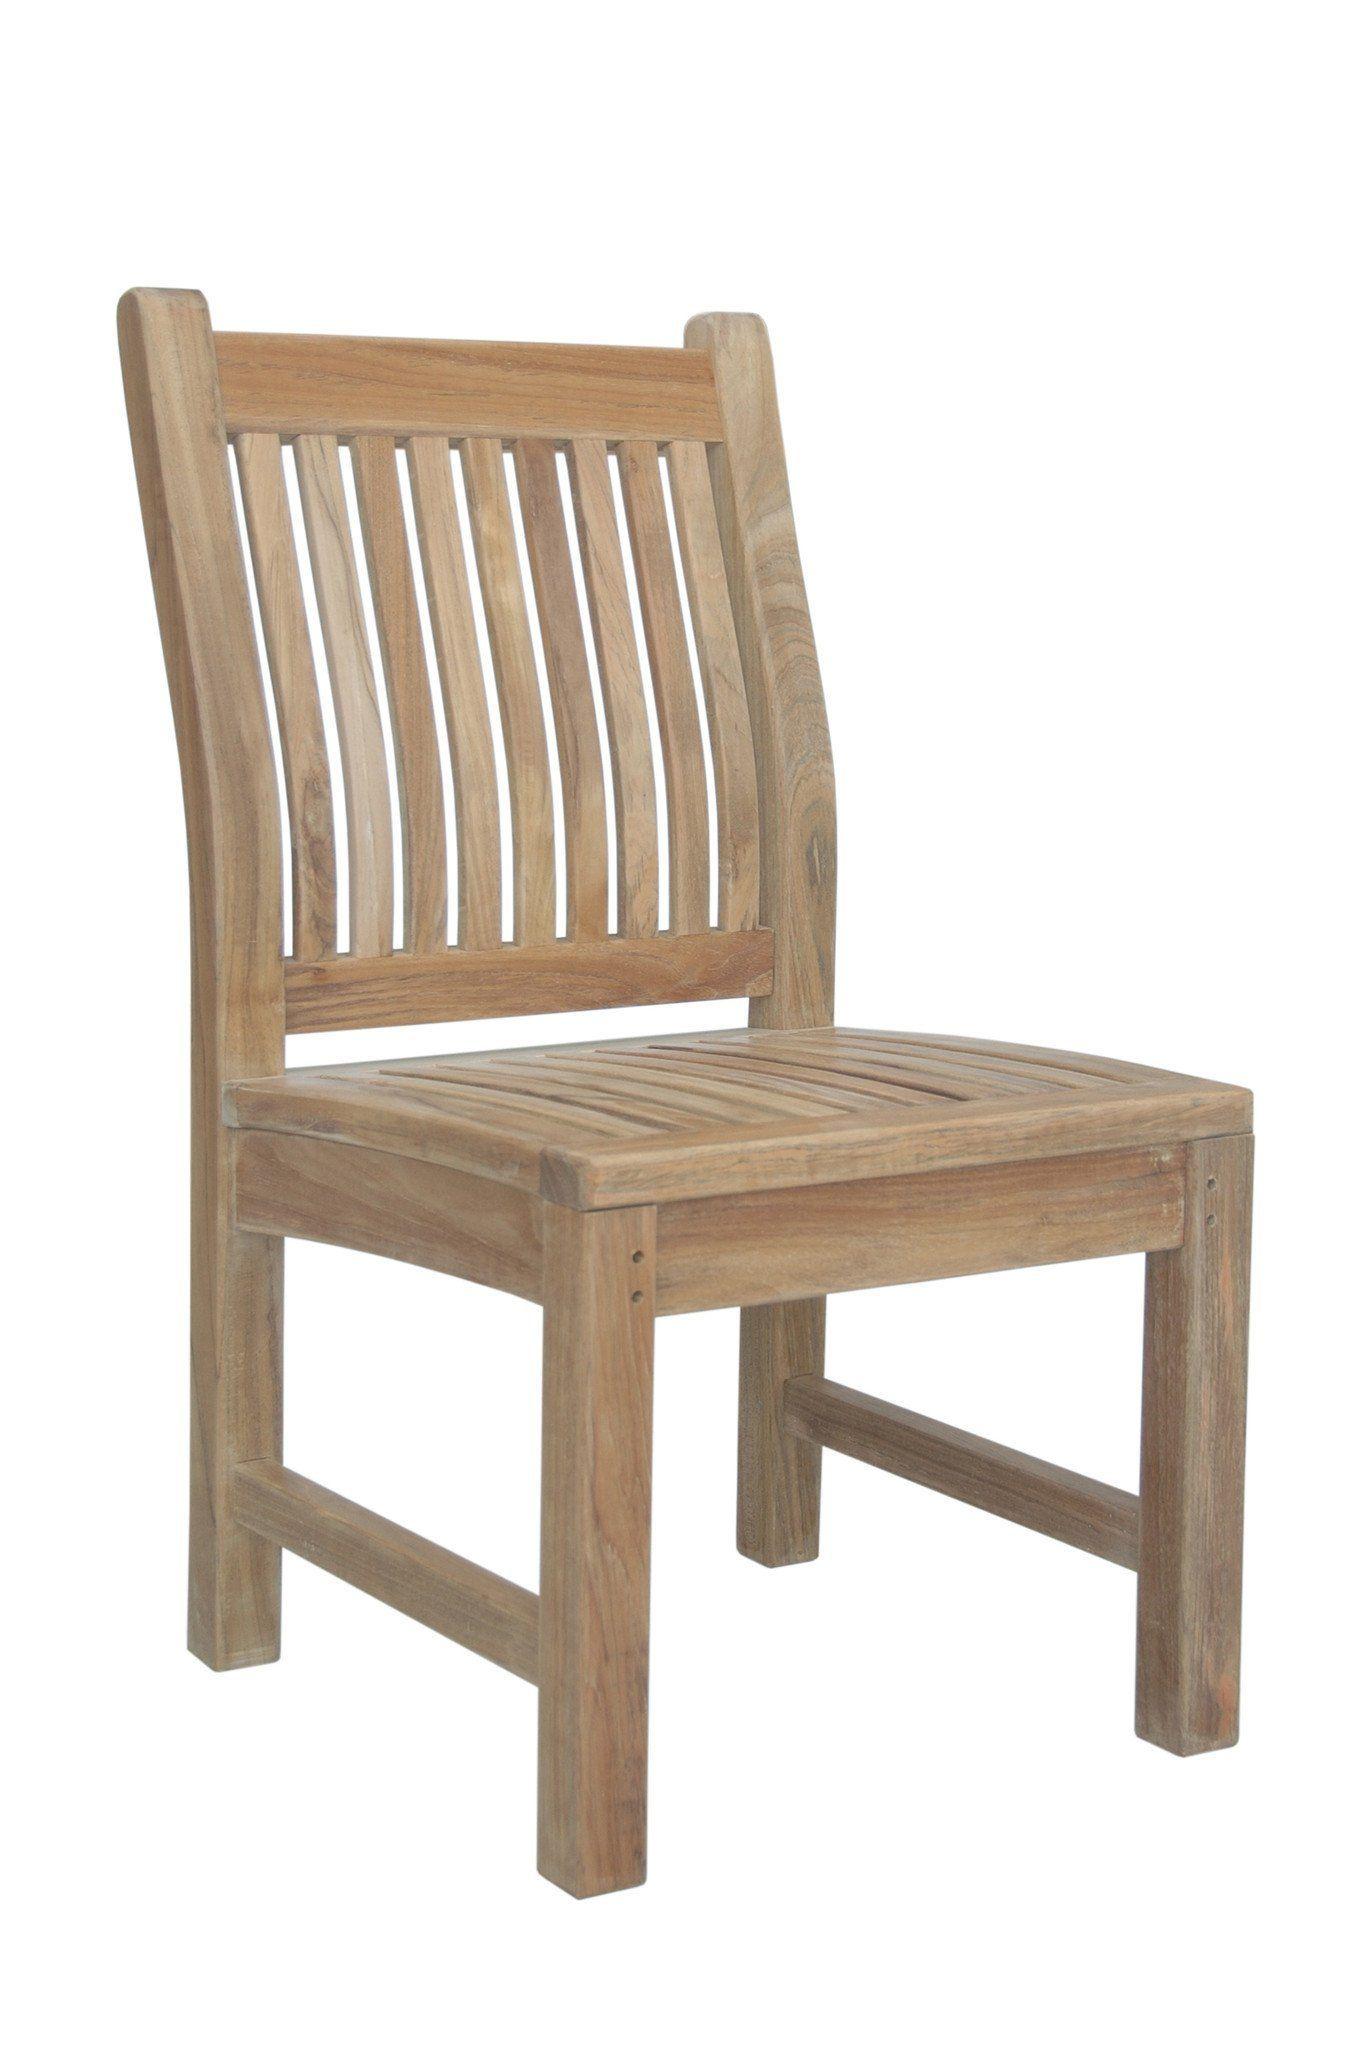 anderson teak chd111 sahara outdoor dining chair teak wood patio rh pinterest co uk